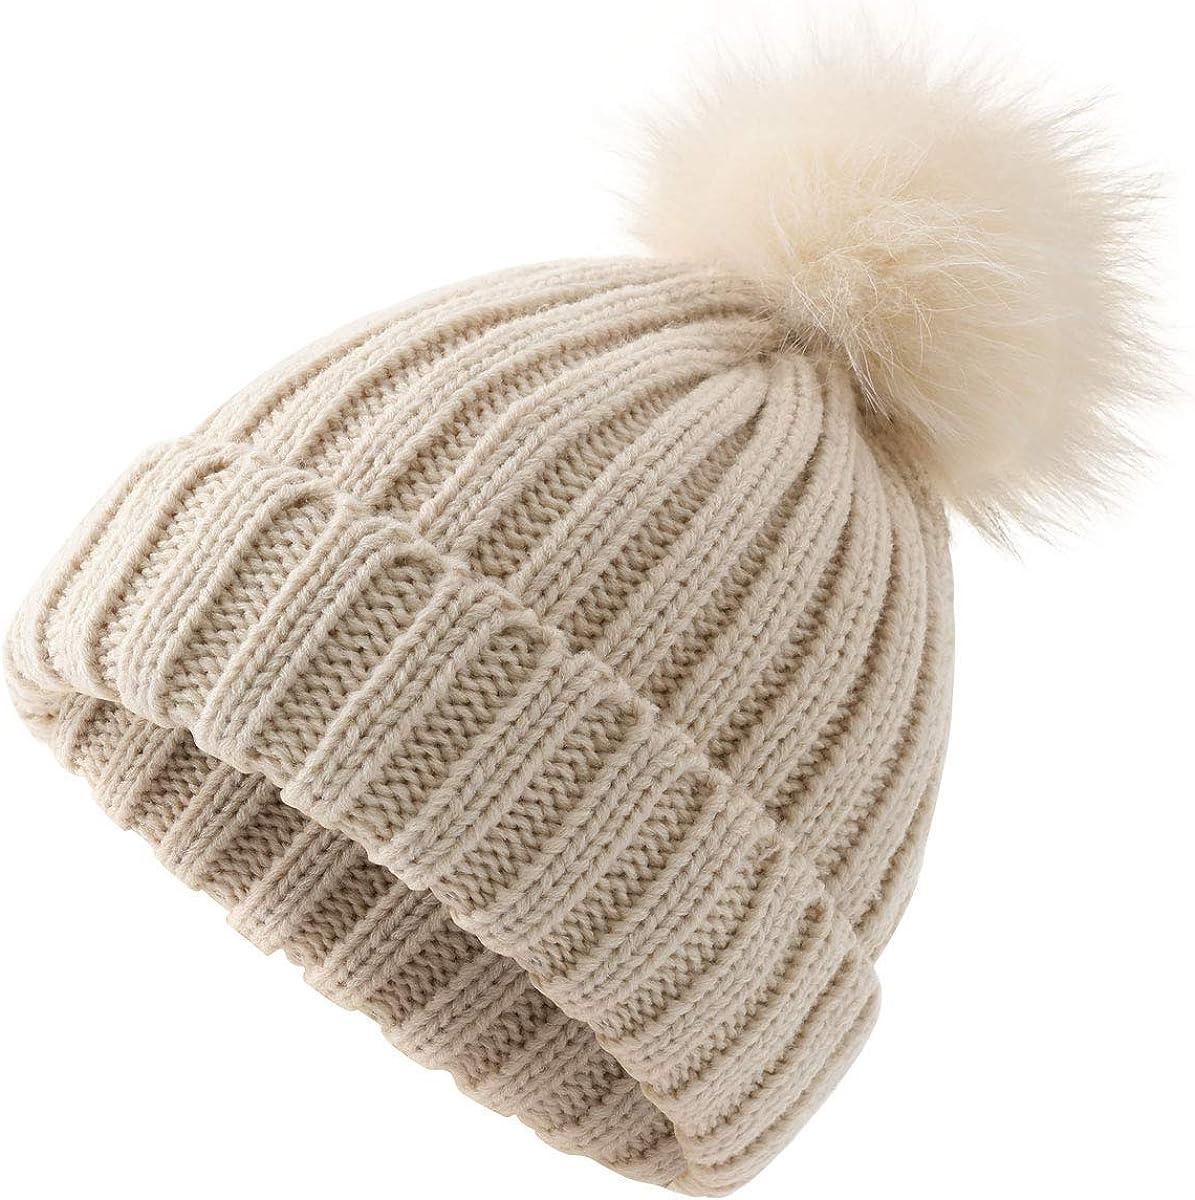 2018 Children Winter Raccoon Fur Hats 100/% Real Fox Fur Pompom Beanies Natural Fur Hat for Kids Girls Skullies